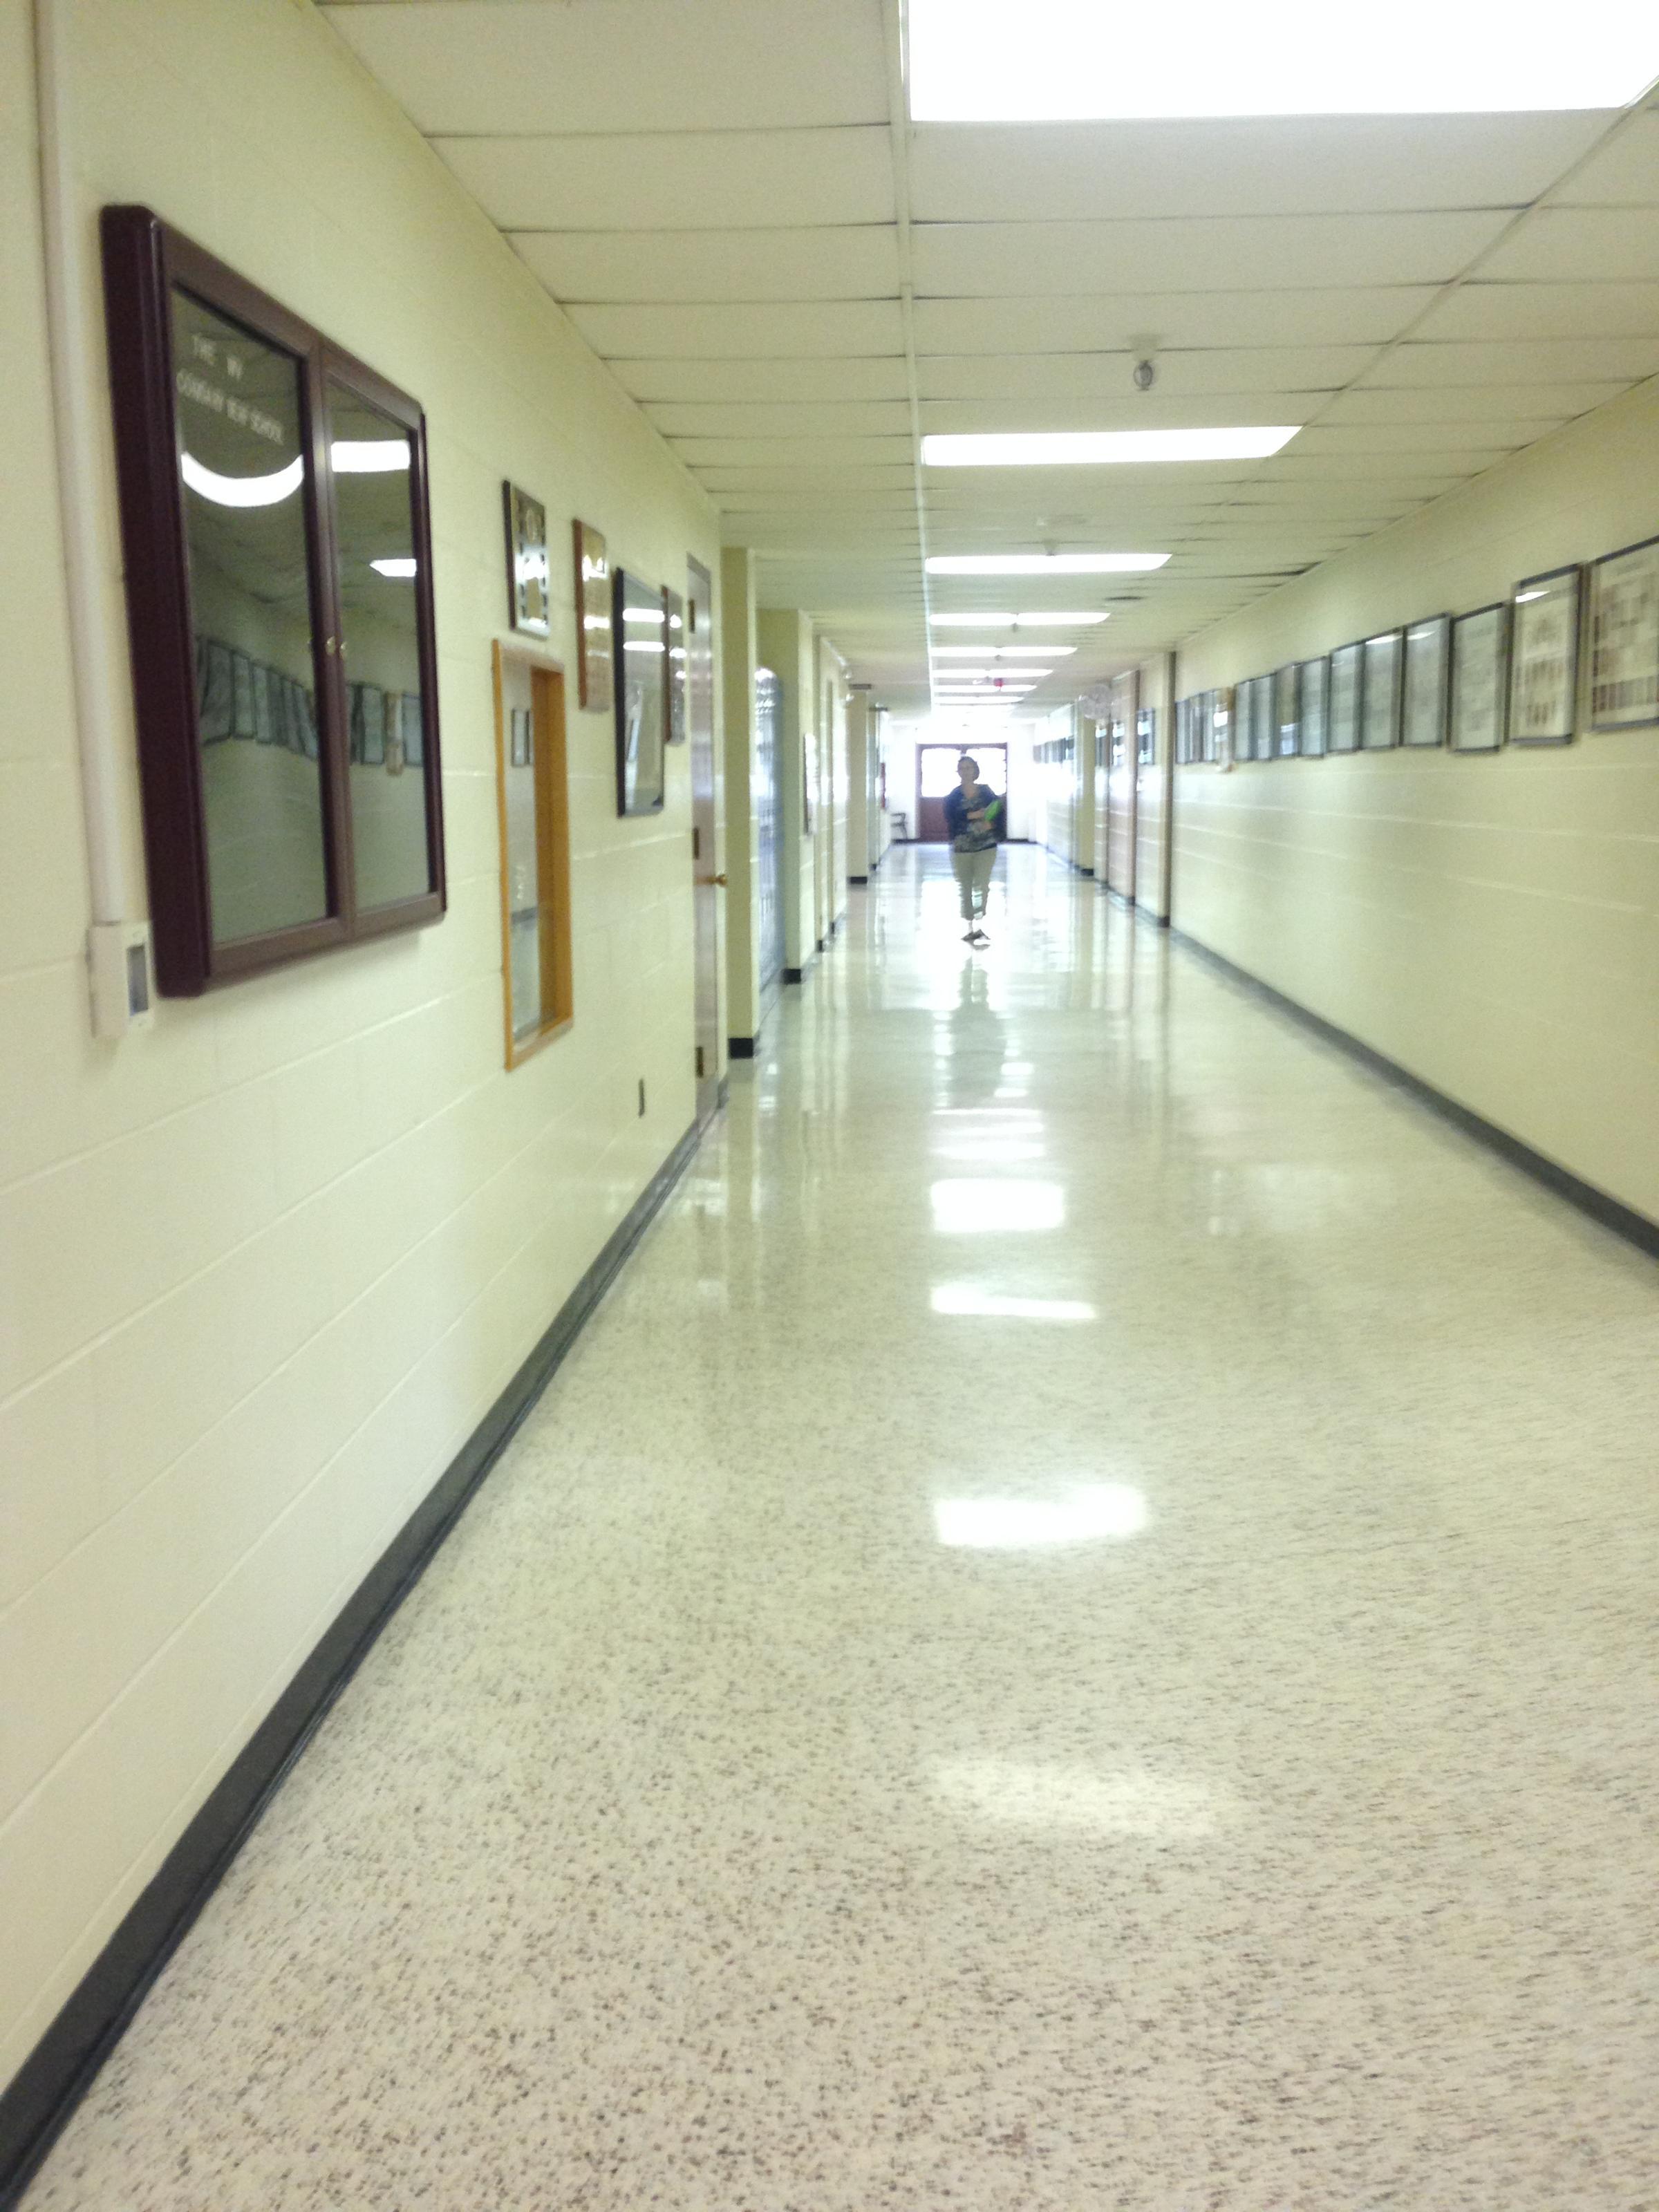 Schools for Deaf and Blind Struggling for Funding Solutions after